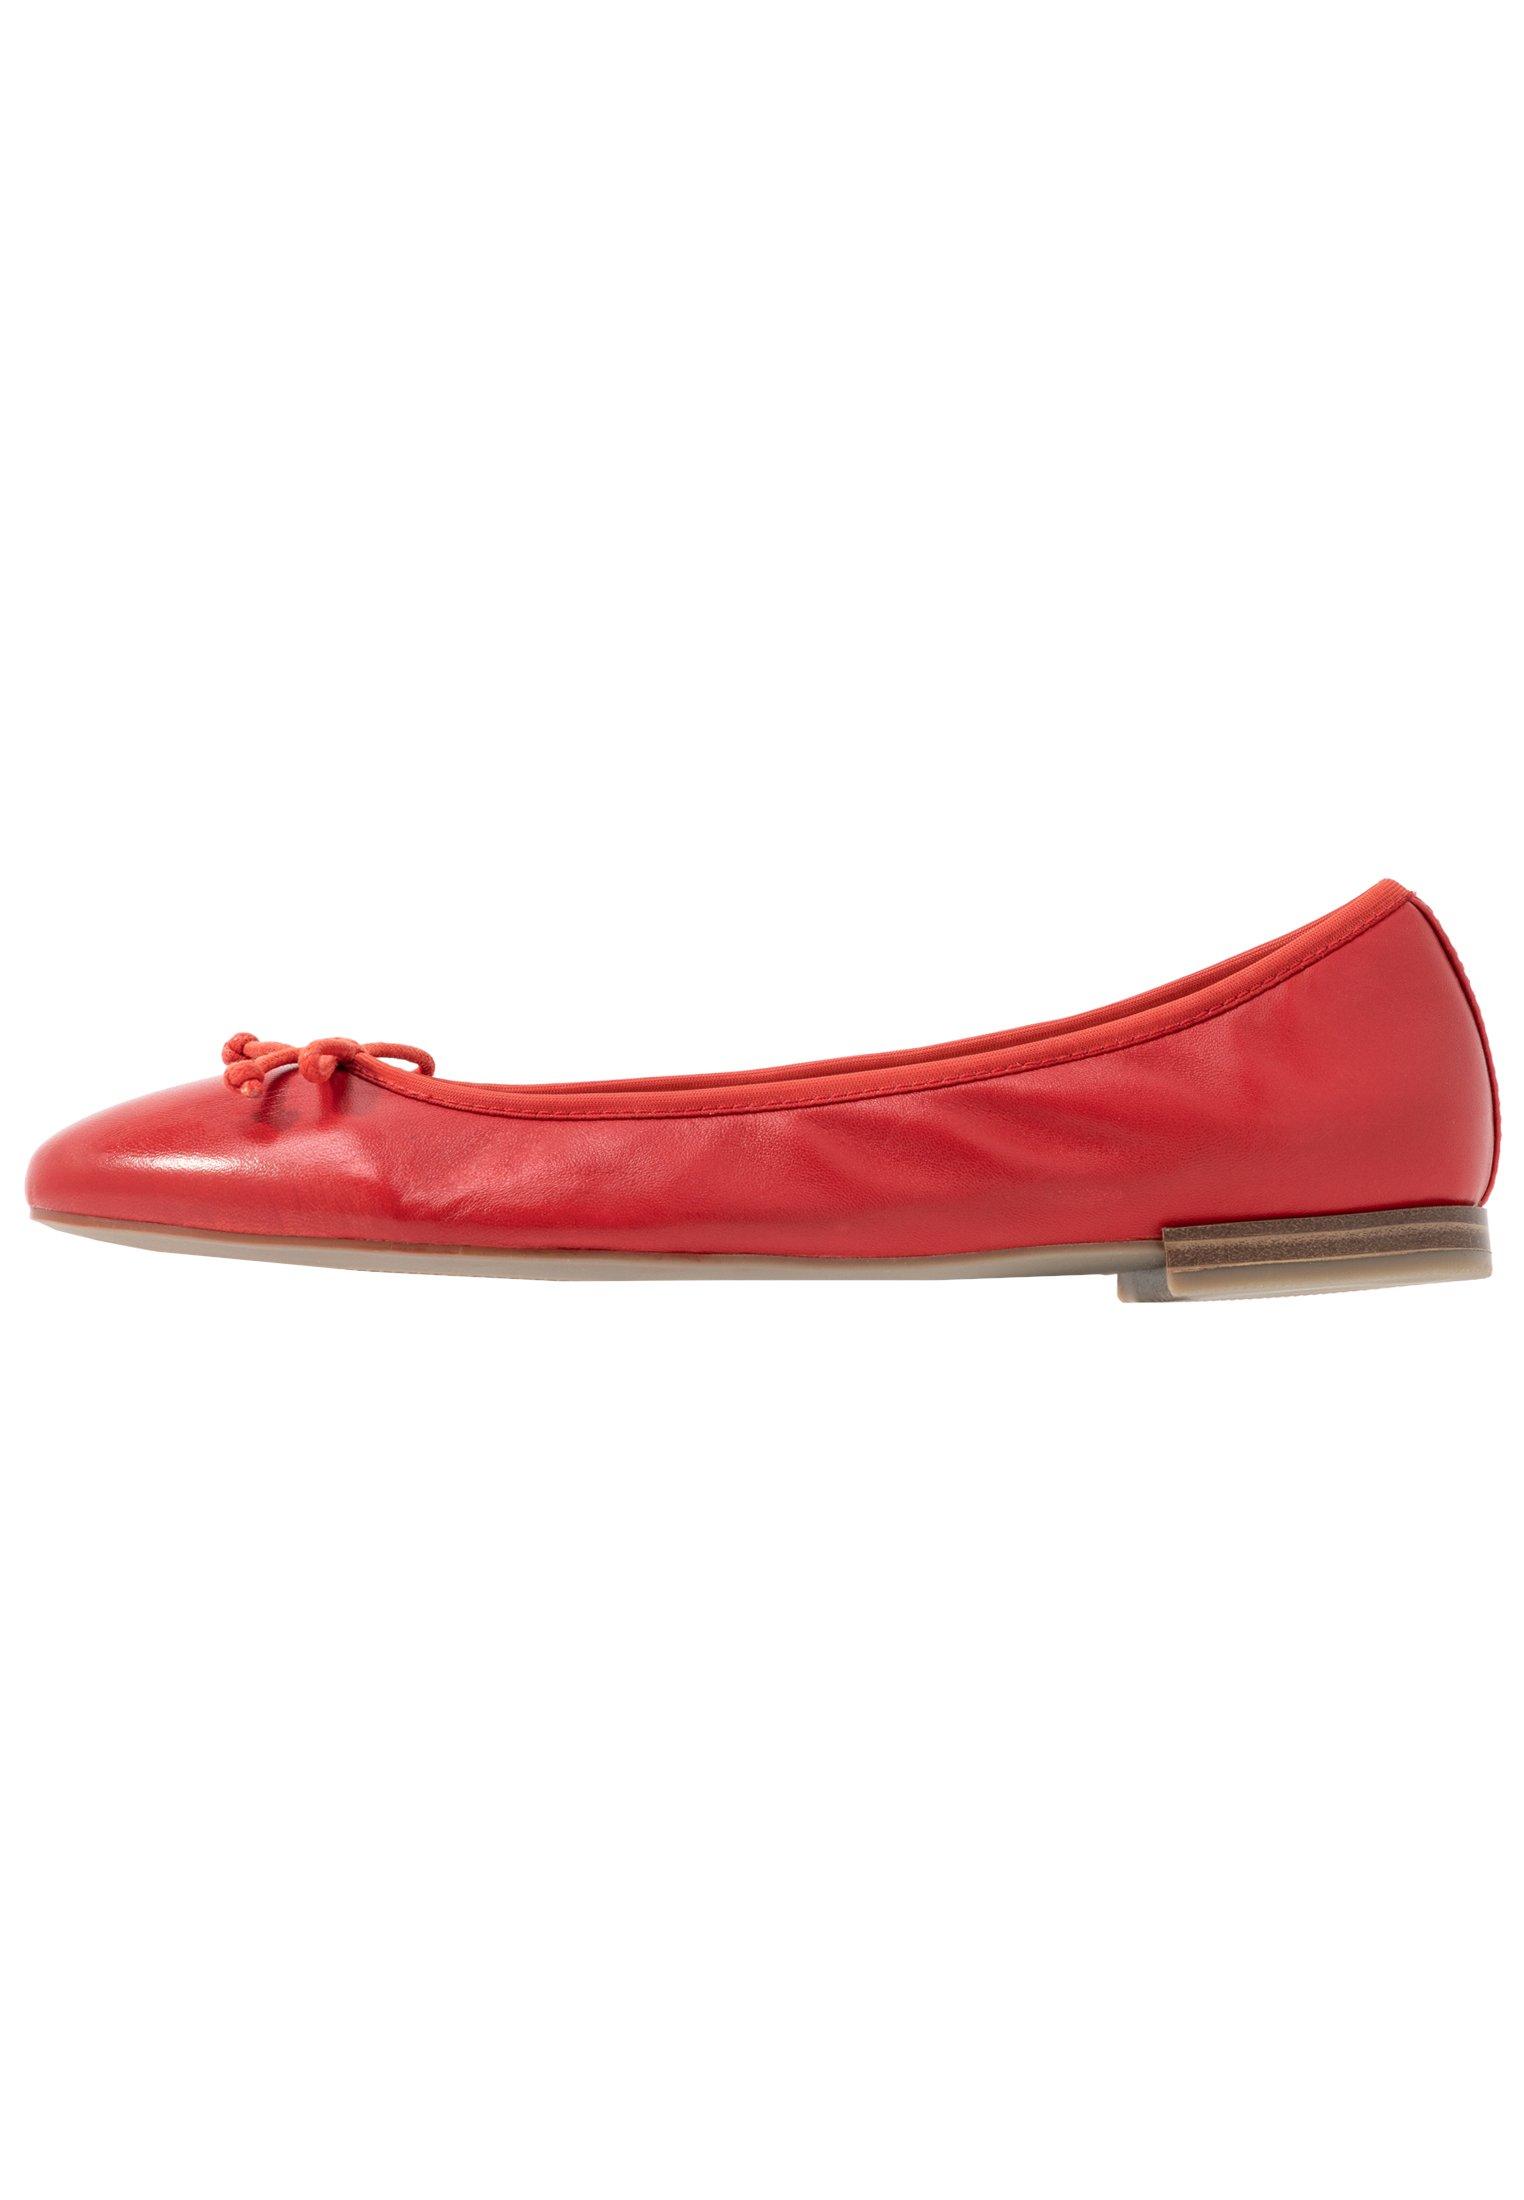 Caprice Ballerina - red